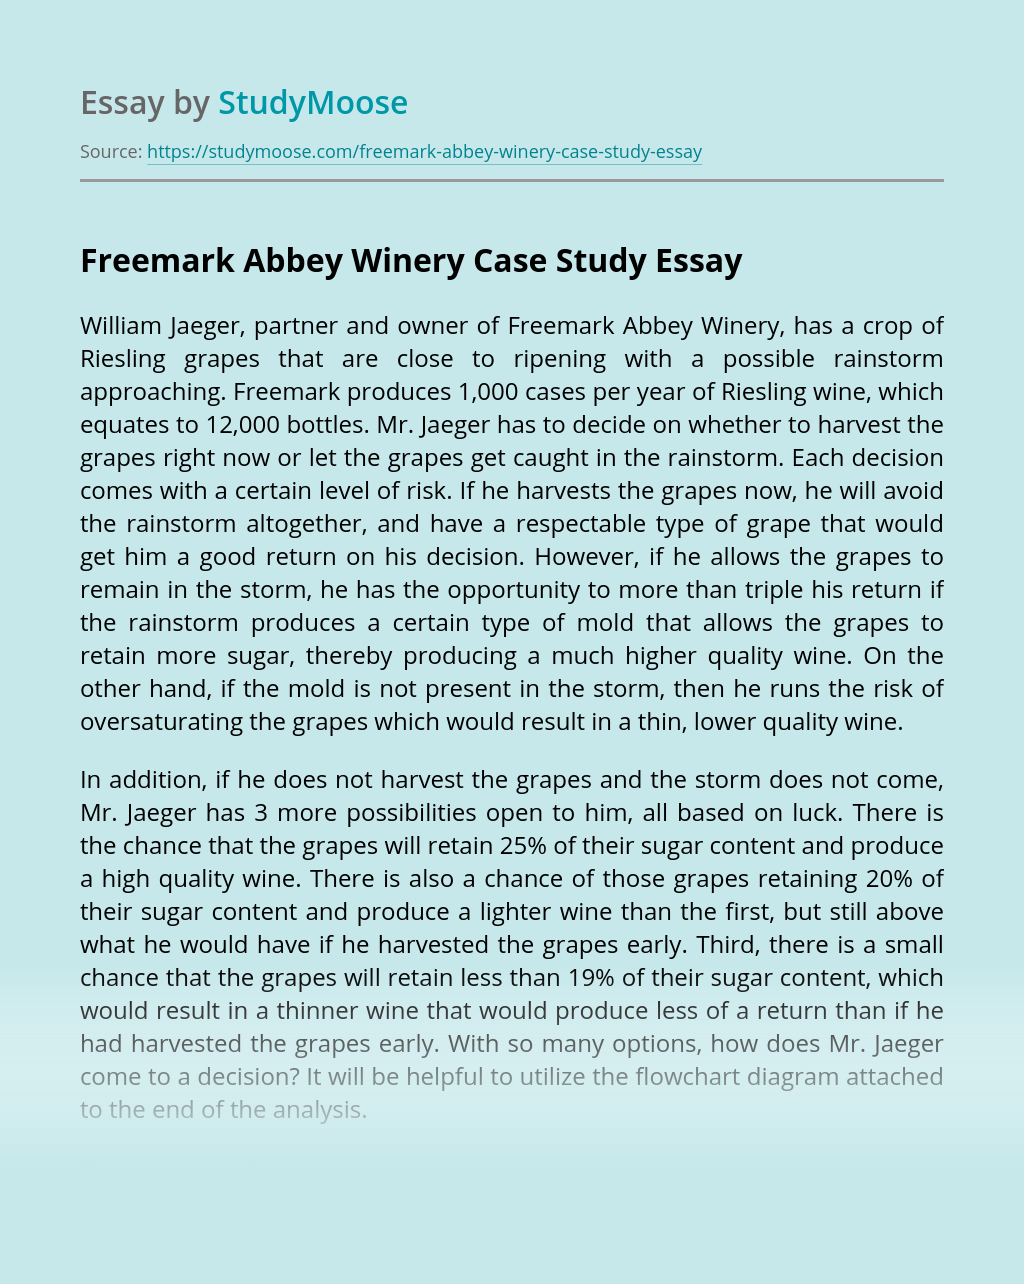 Freemark Abbey Winery Case Study